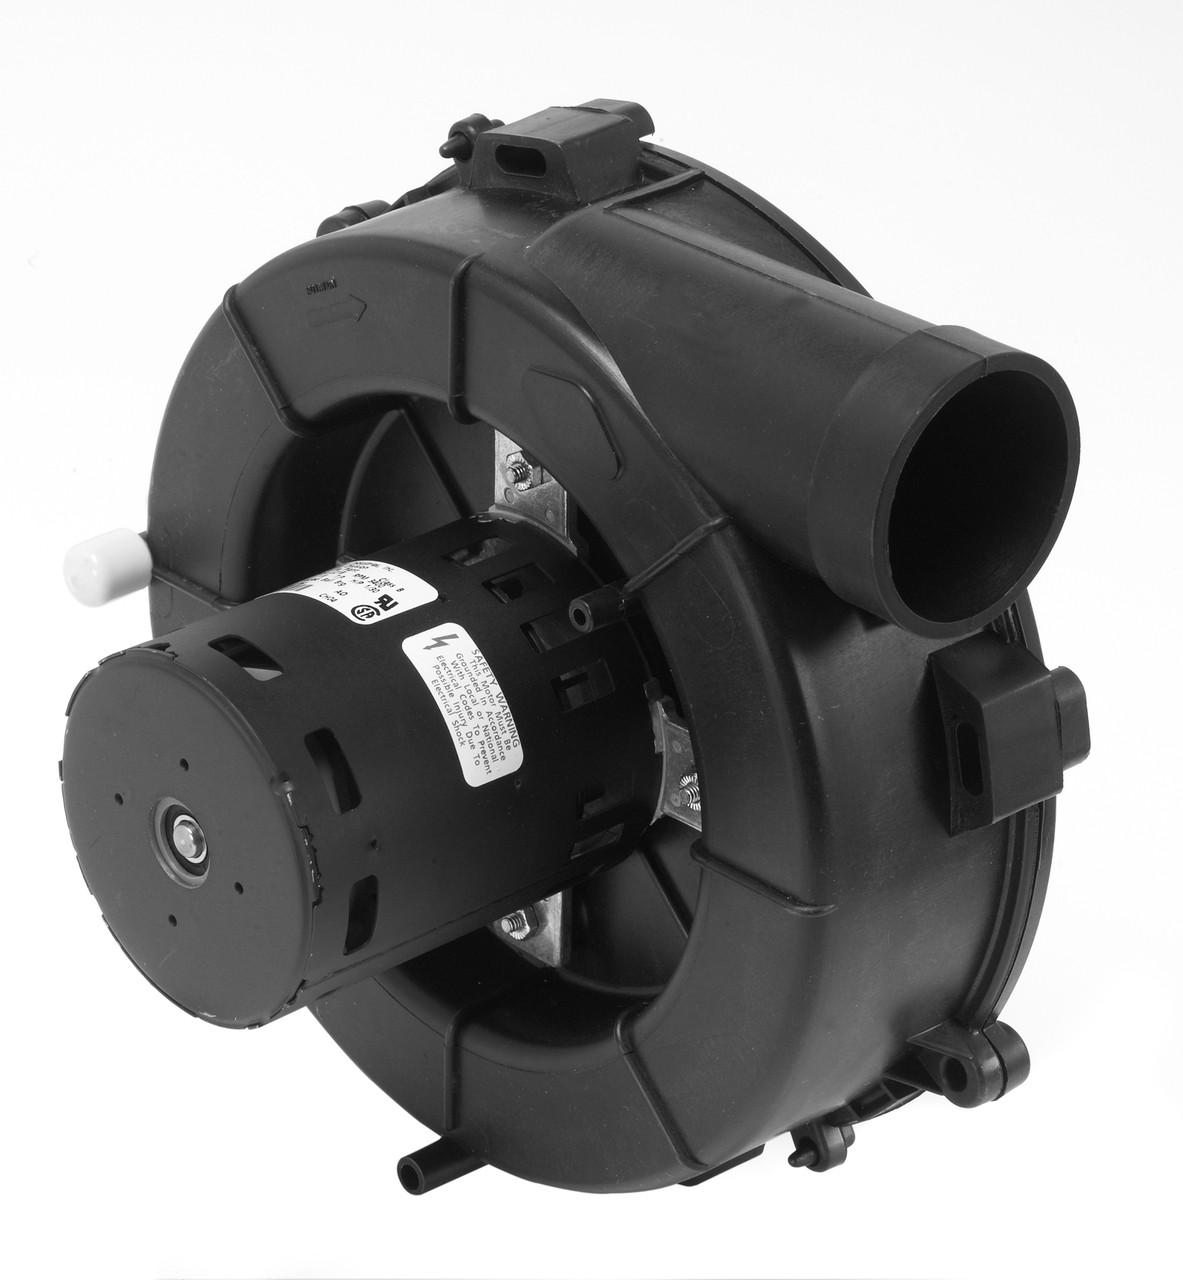 Fasco A224 York (024-27654-000) Furnace Draft Inducer